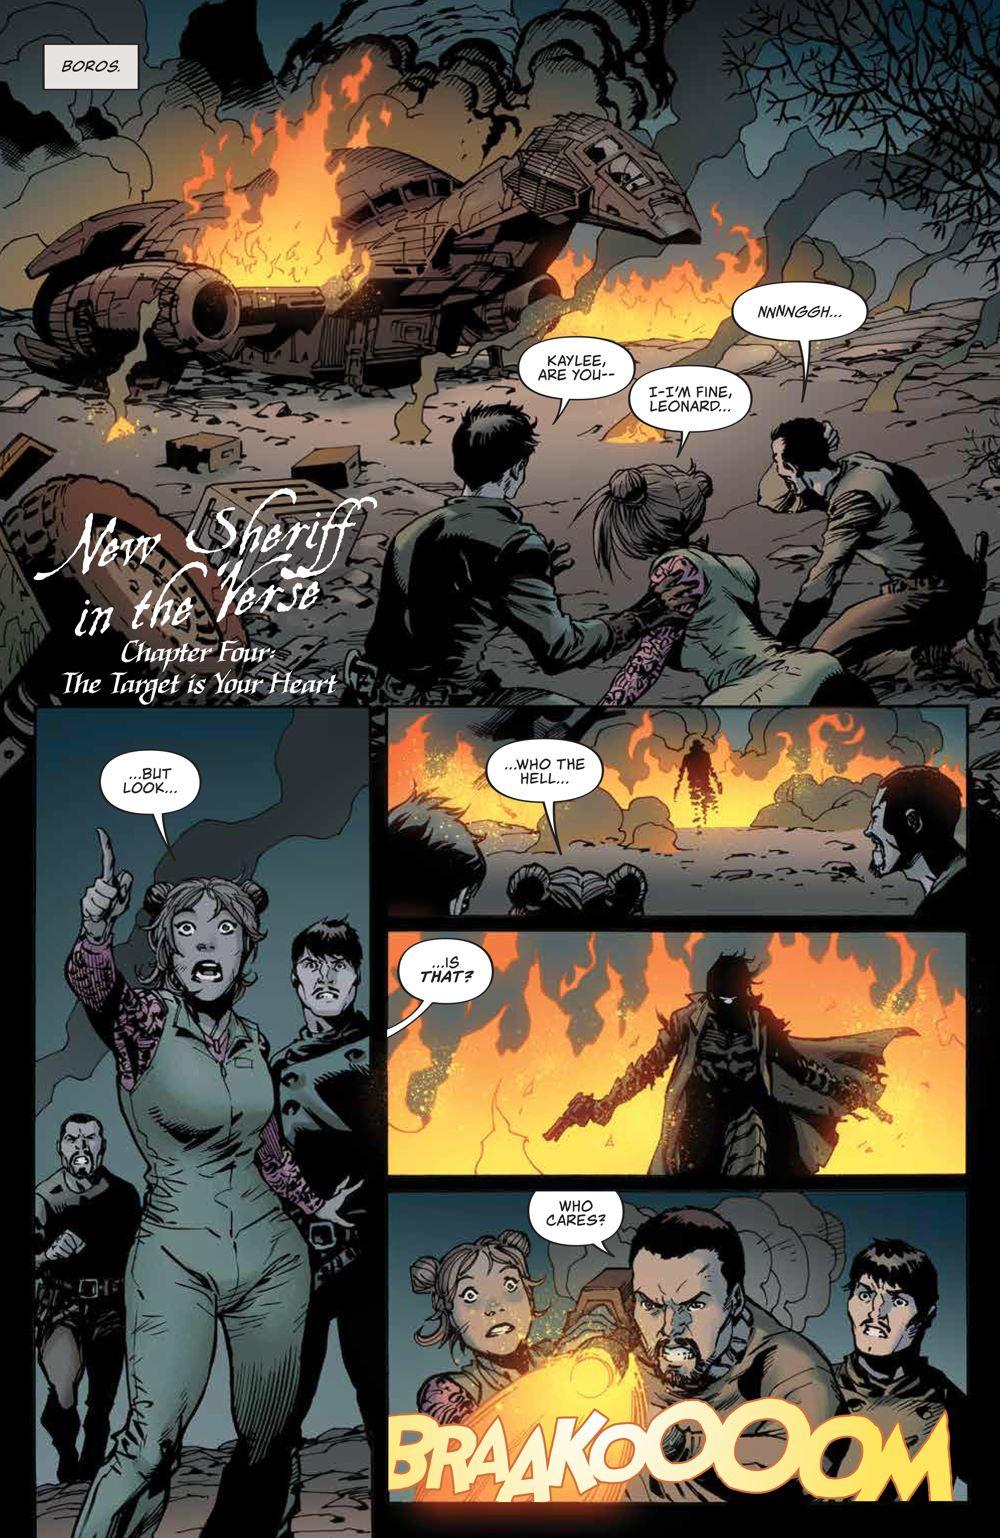 Firefly_NewSheriffVerse_v2_HC_PRESS_11 ComicList Previews: FIREFLY NEW SHERIFF IN THE 'VERSE VOLUME 2 HC